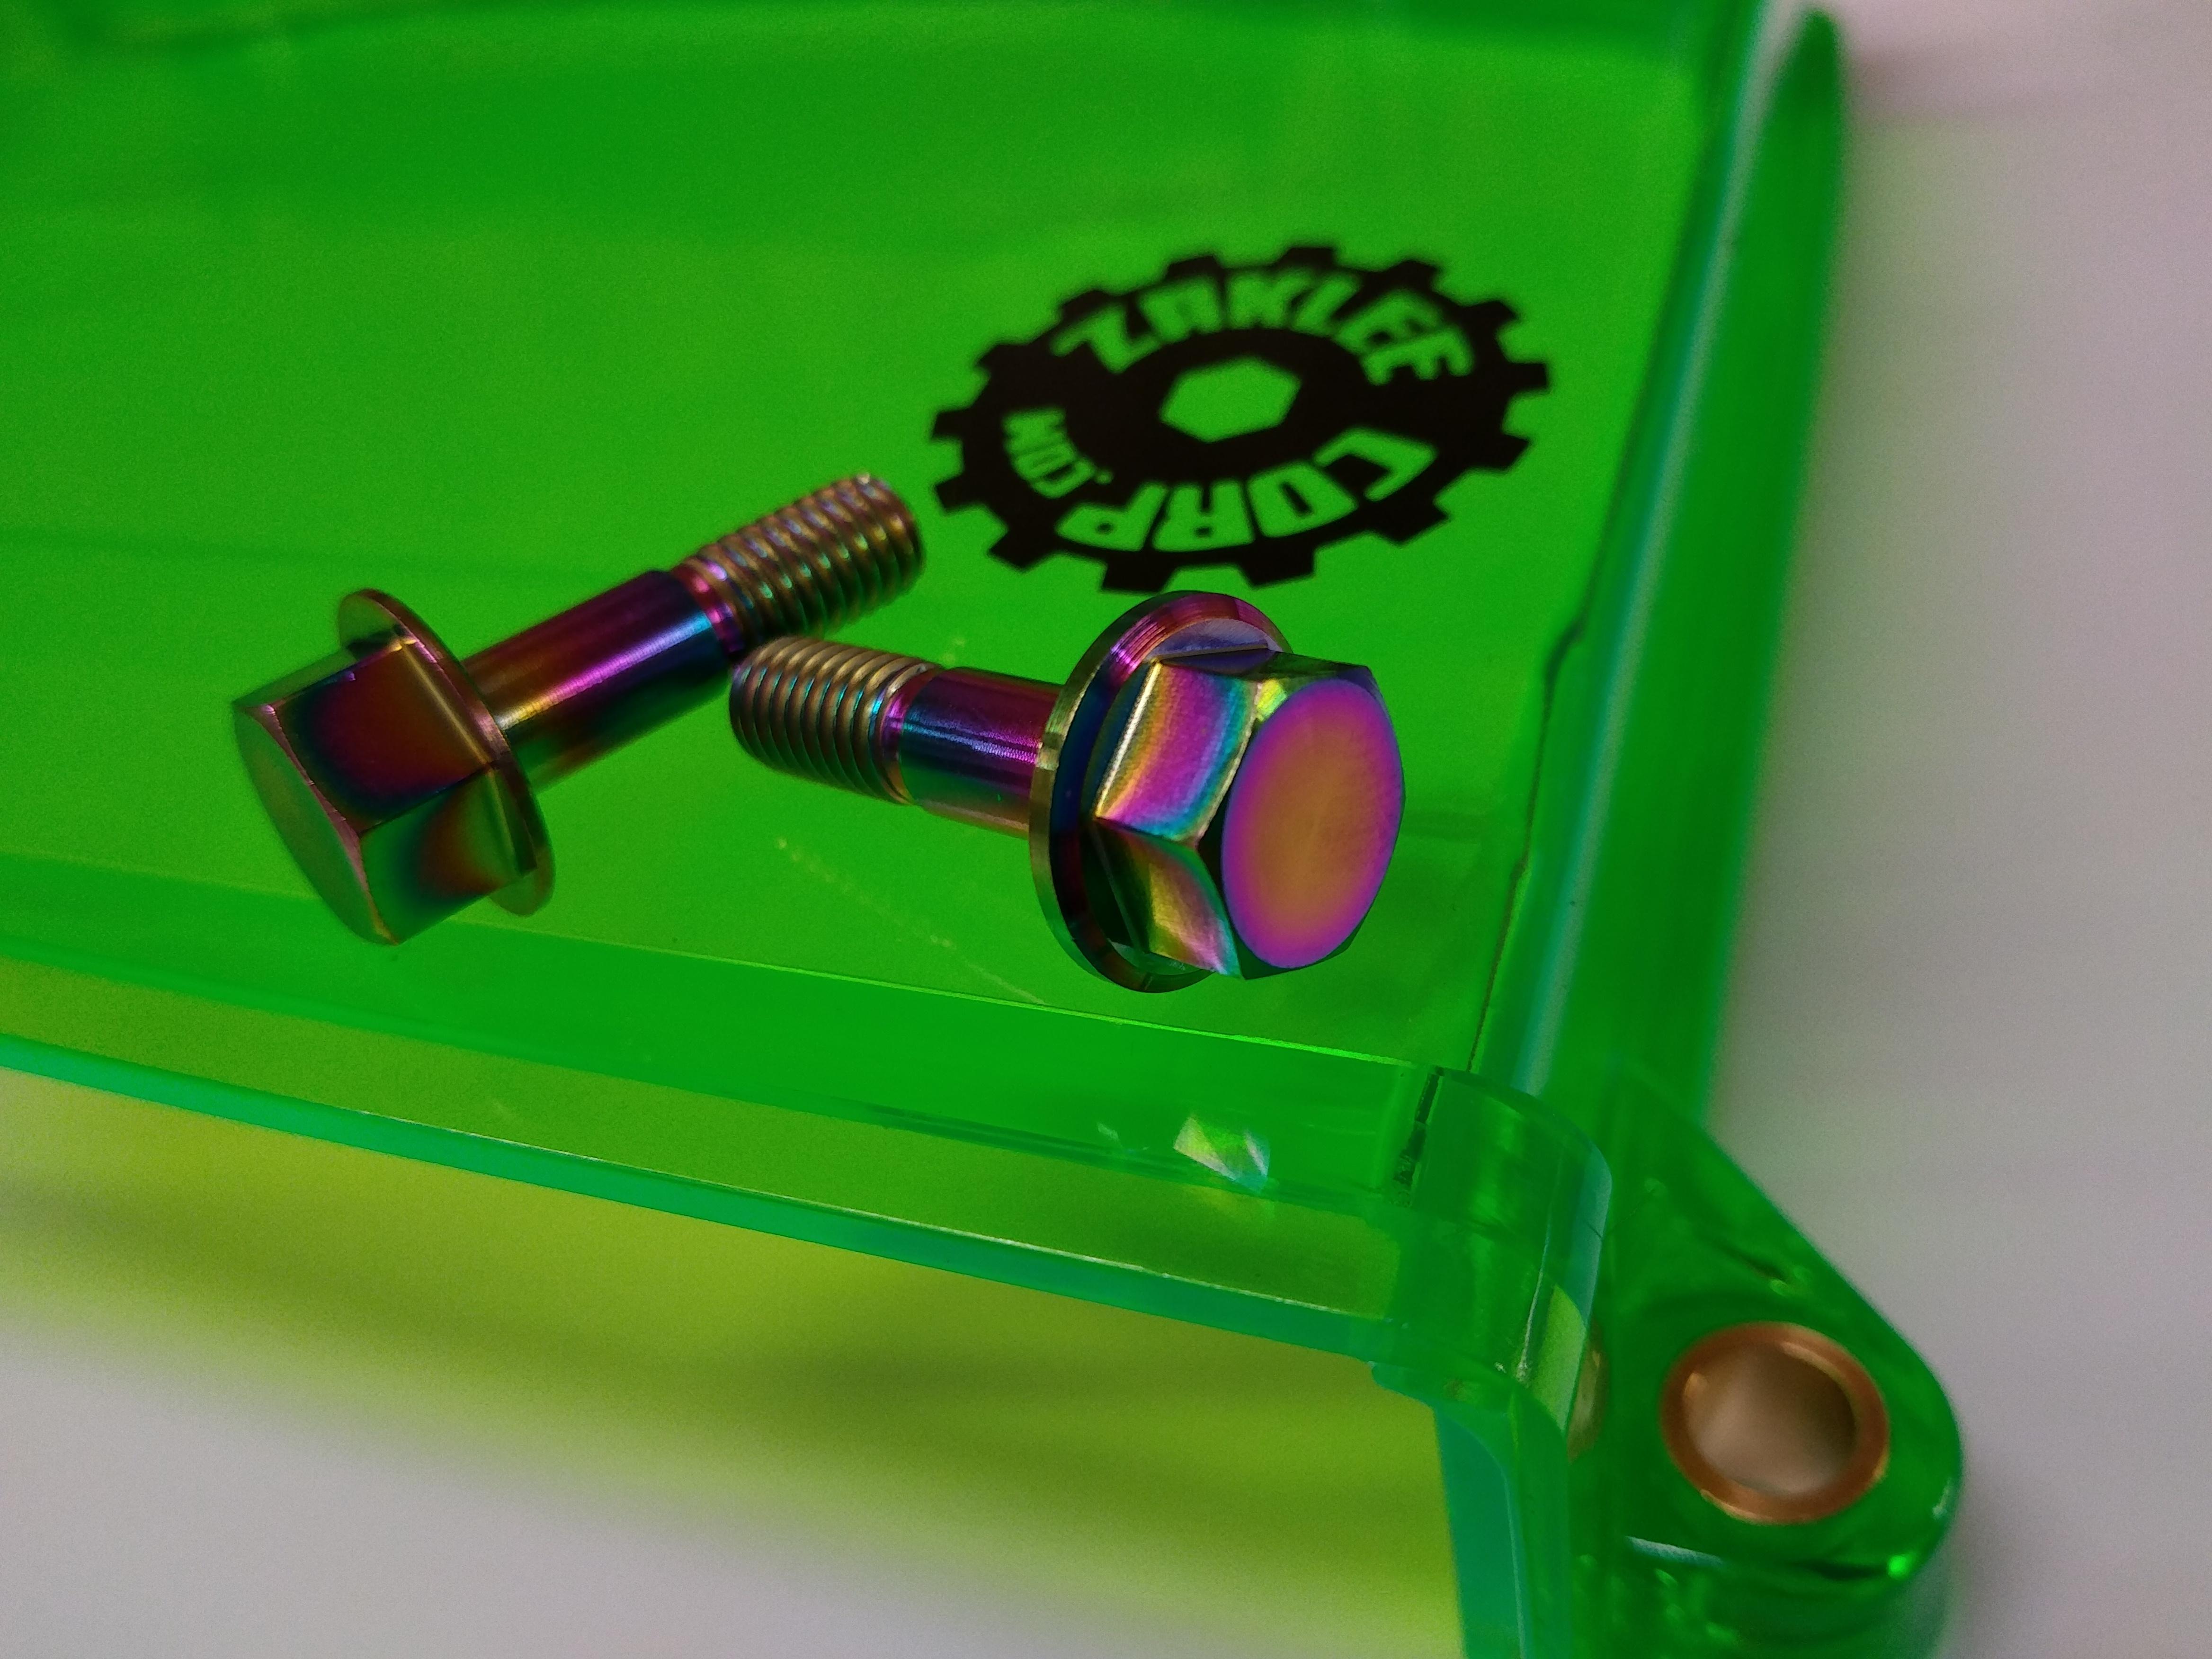 Titanium Bolt Kits for Cam Gear Covers